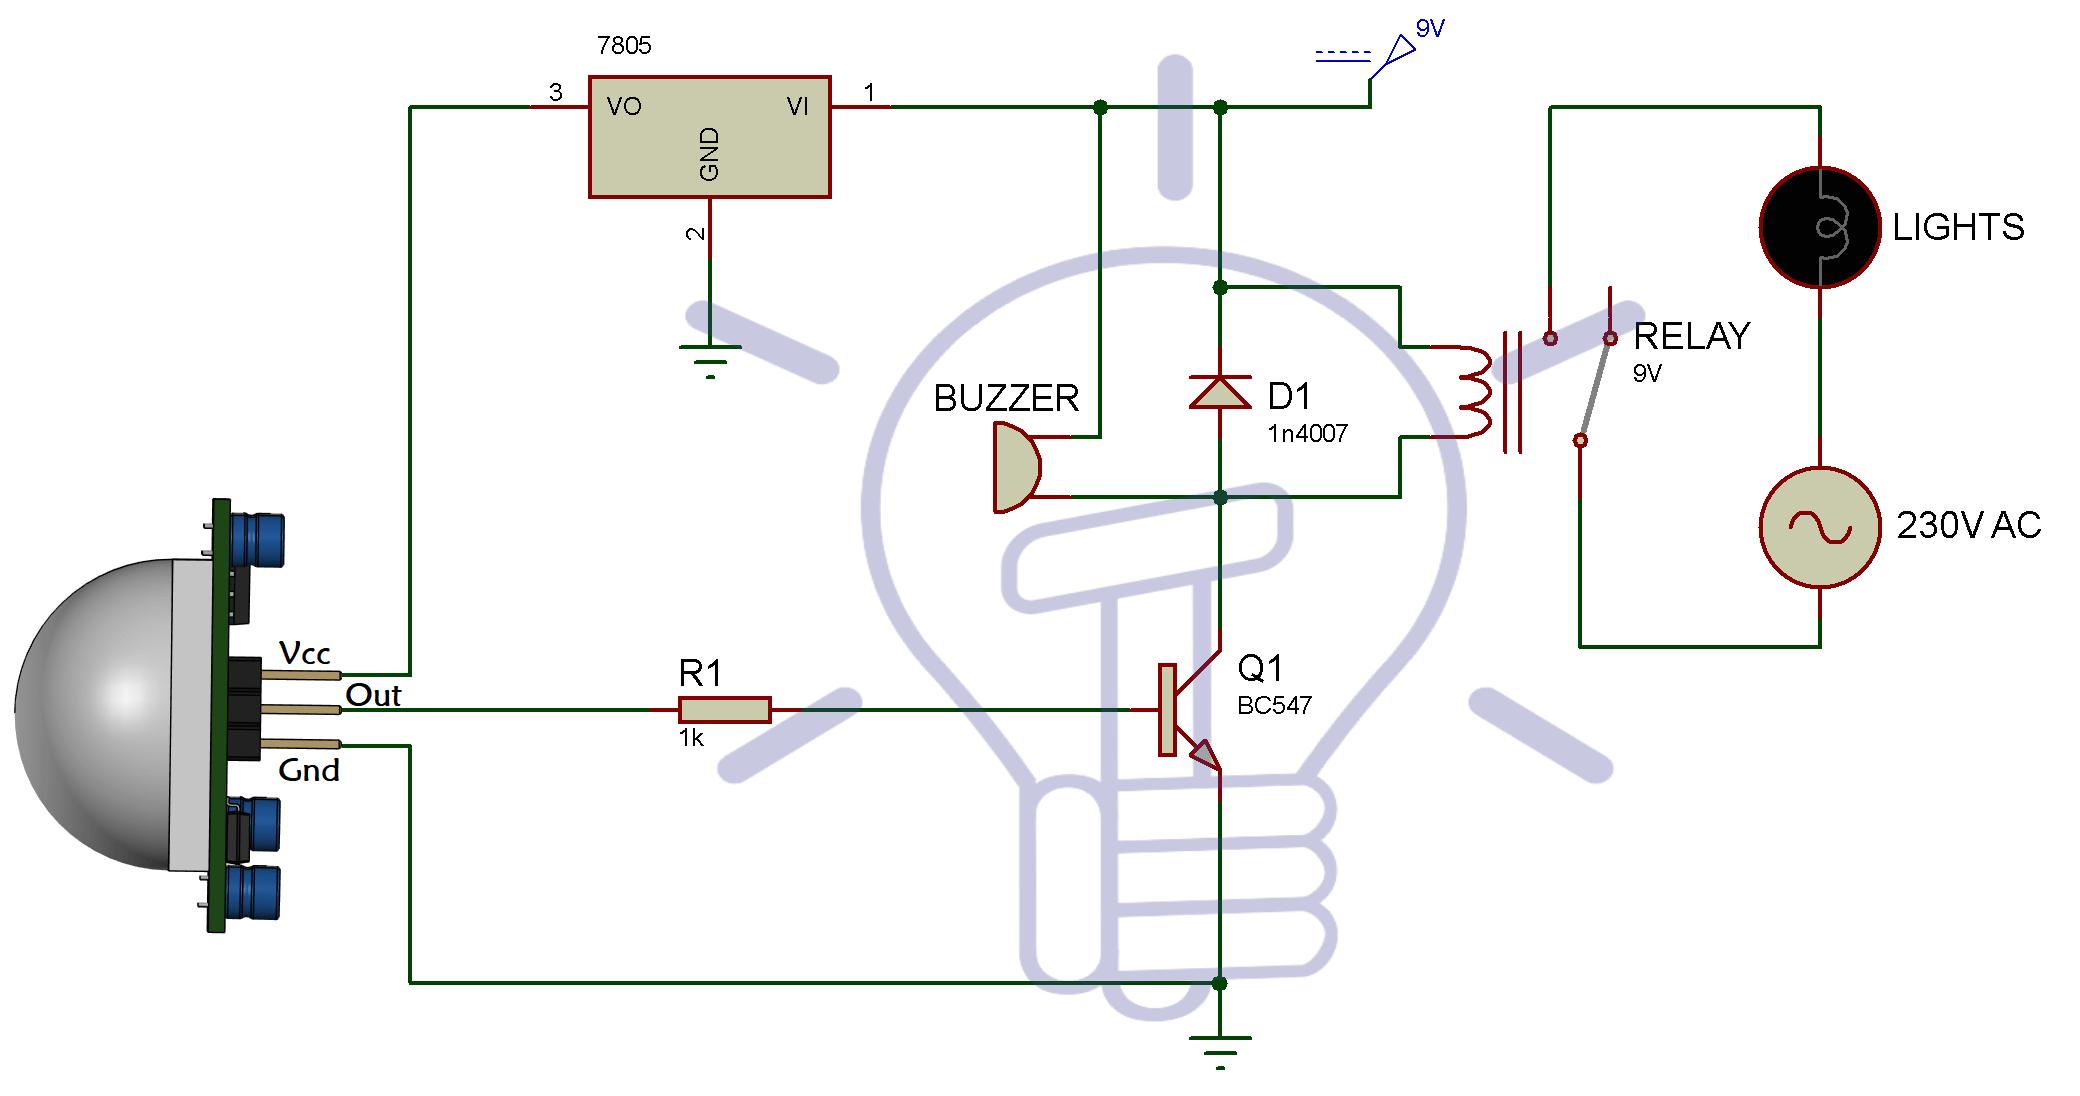 Dsc Motion Detector Wiring Diagram Dsc Motion Detector Wiring Diagram Diagram Base Website